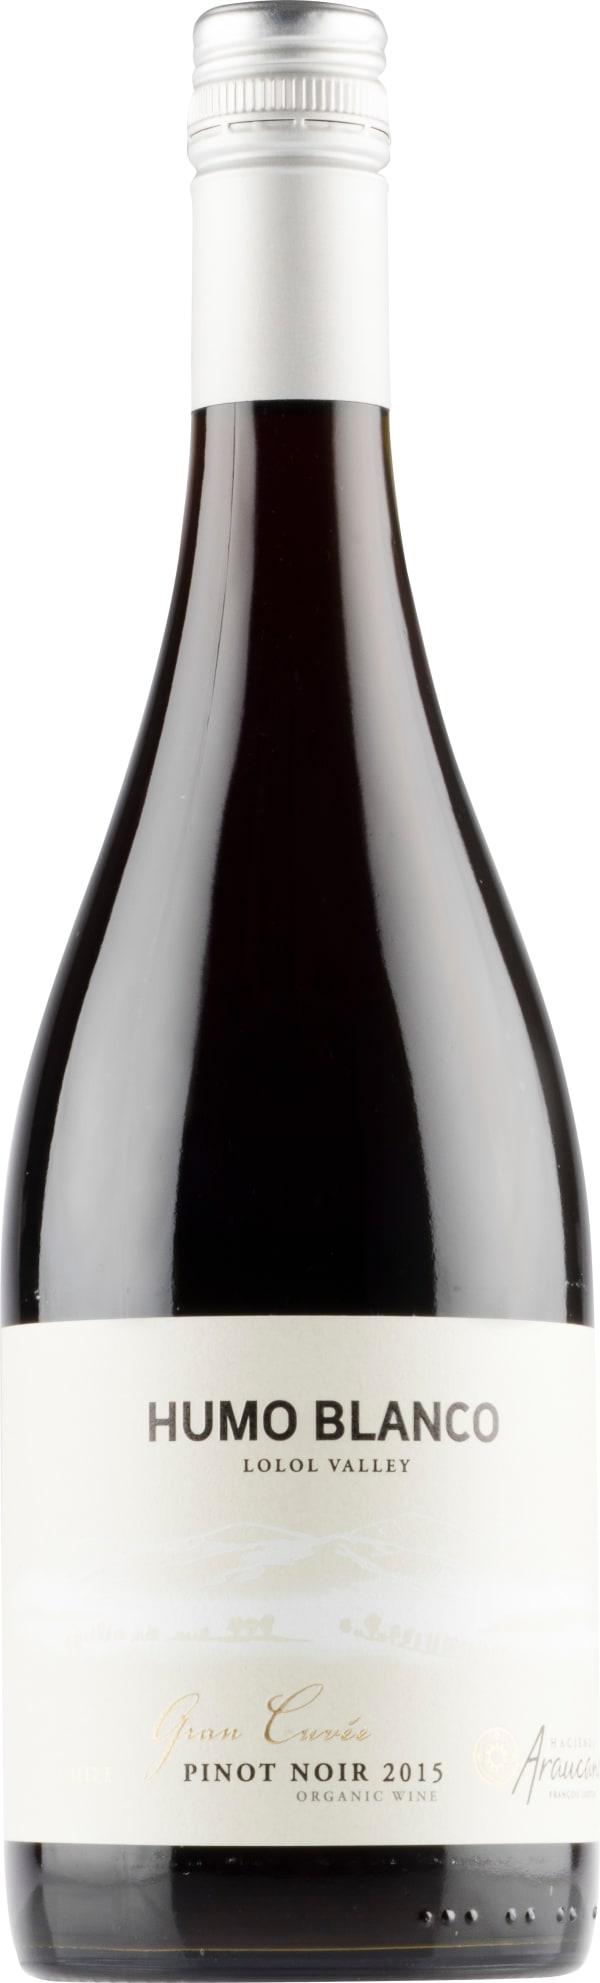 Humo Blanco Grand Cuvée Pinot Noir Organic 2015